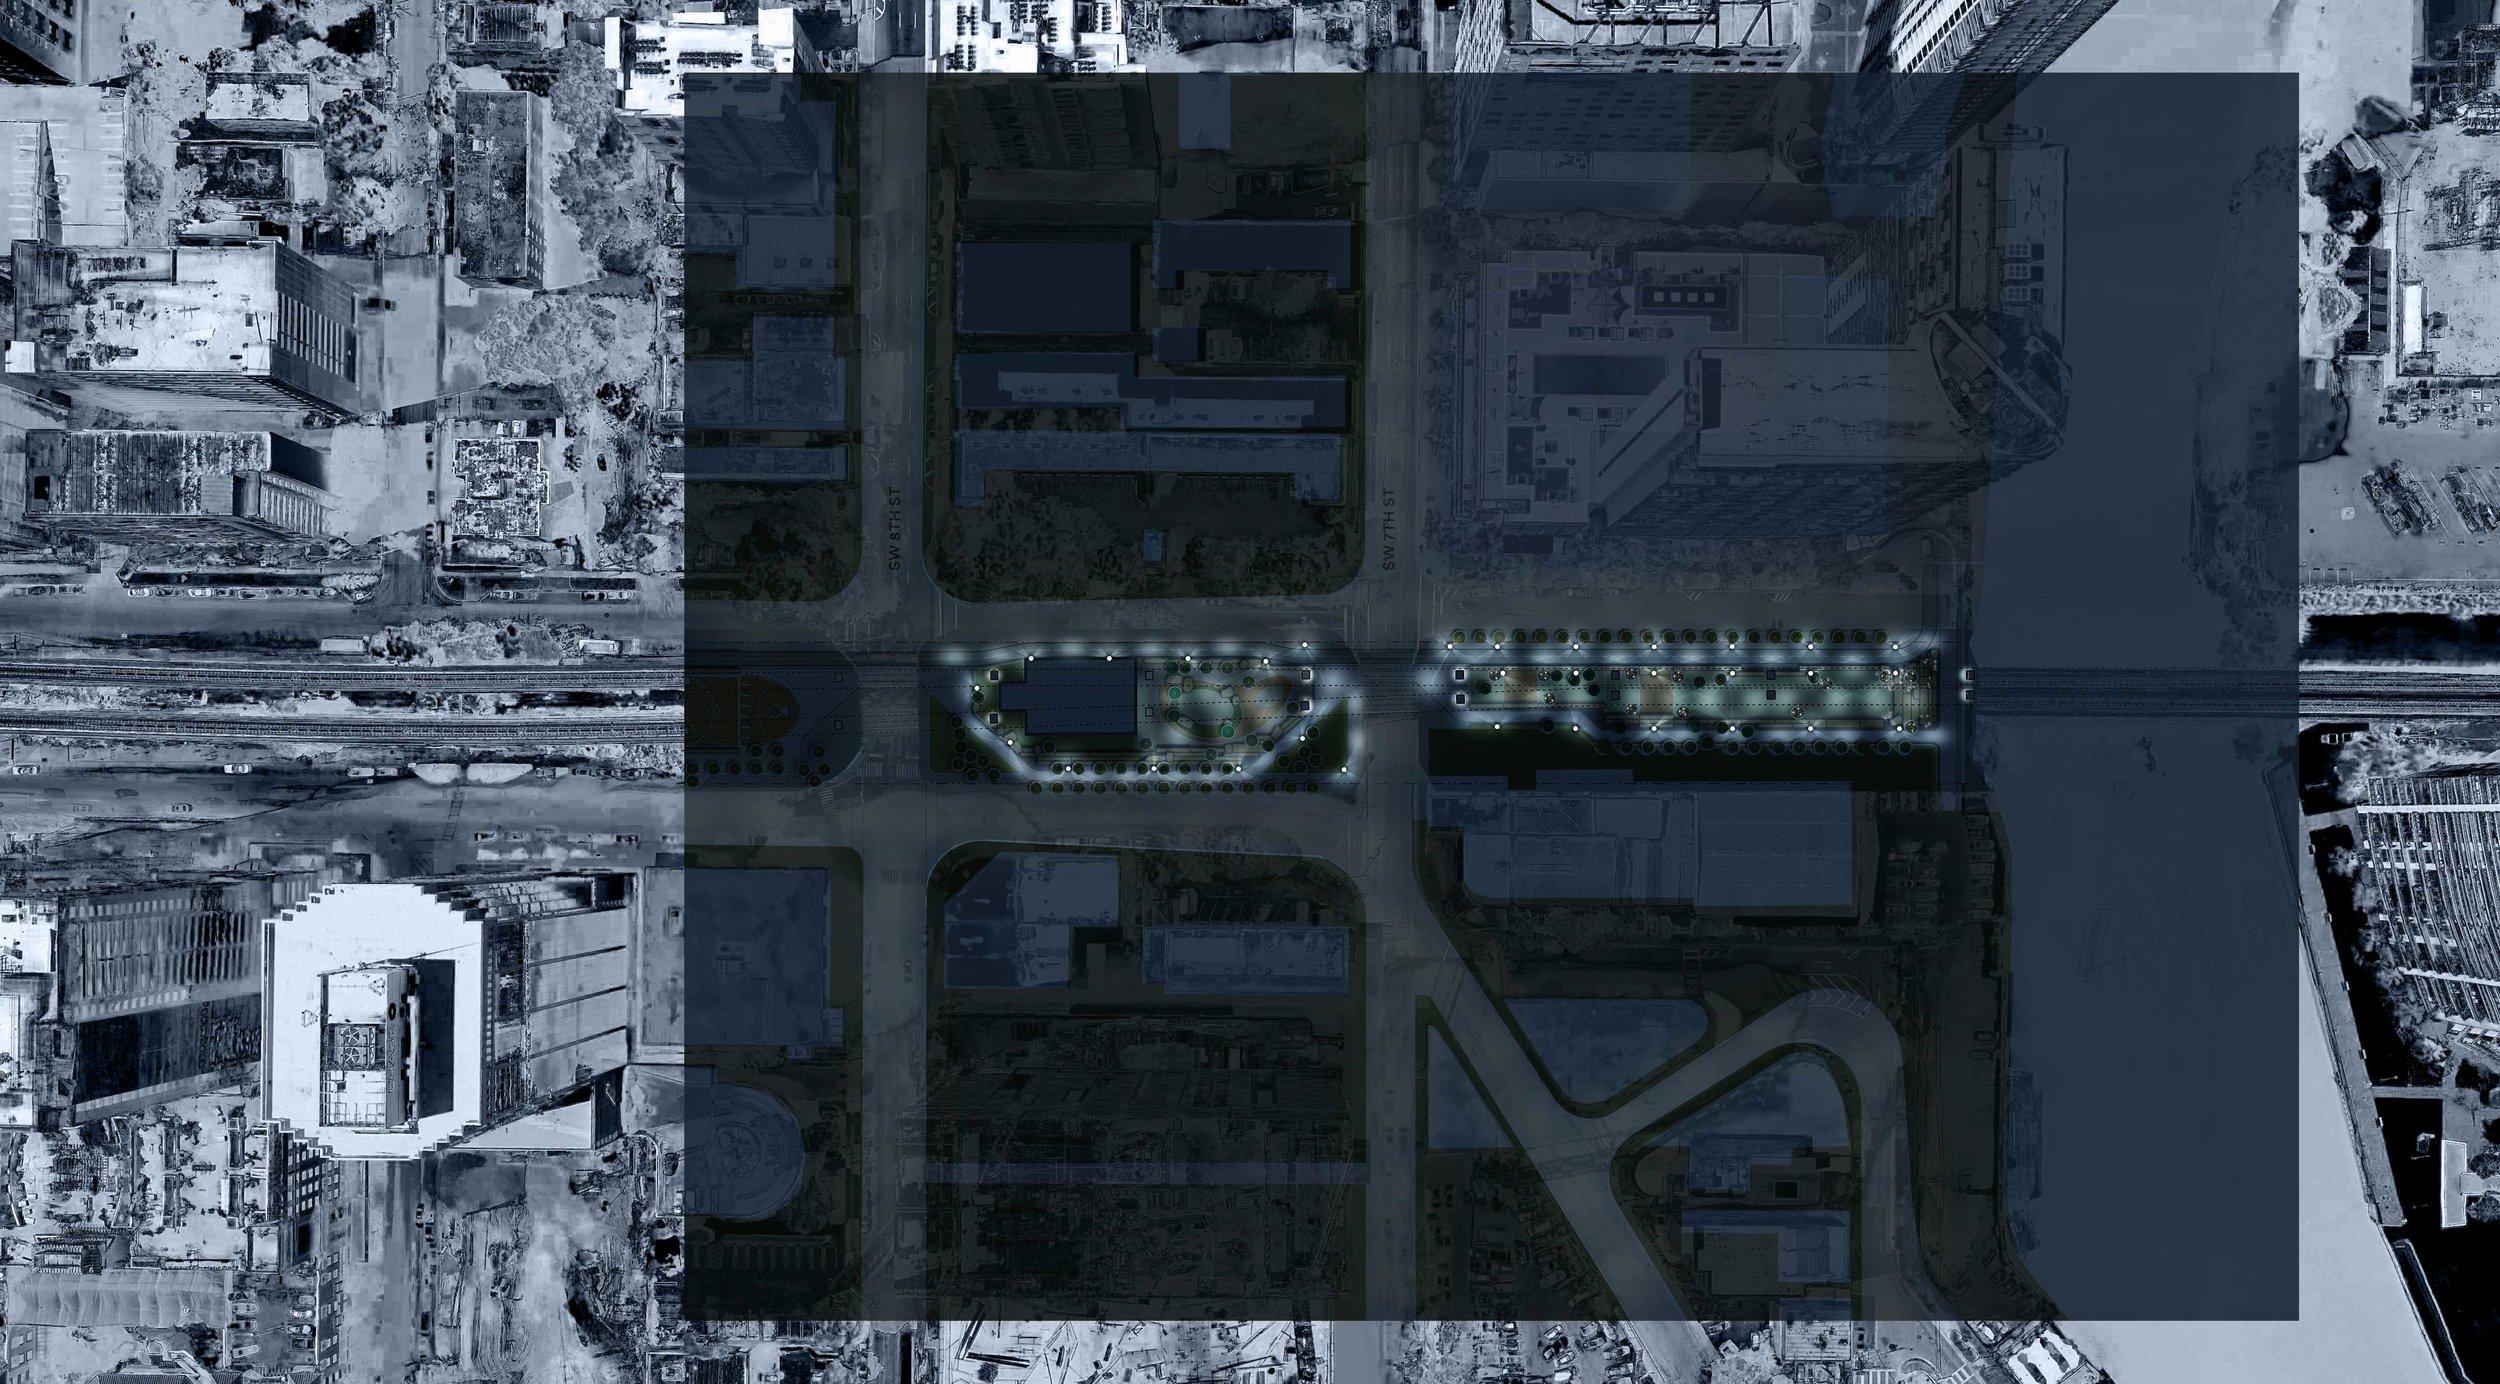 web_Brickell_Aerial_2.jpg